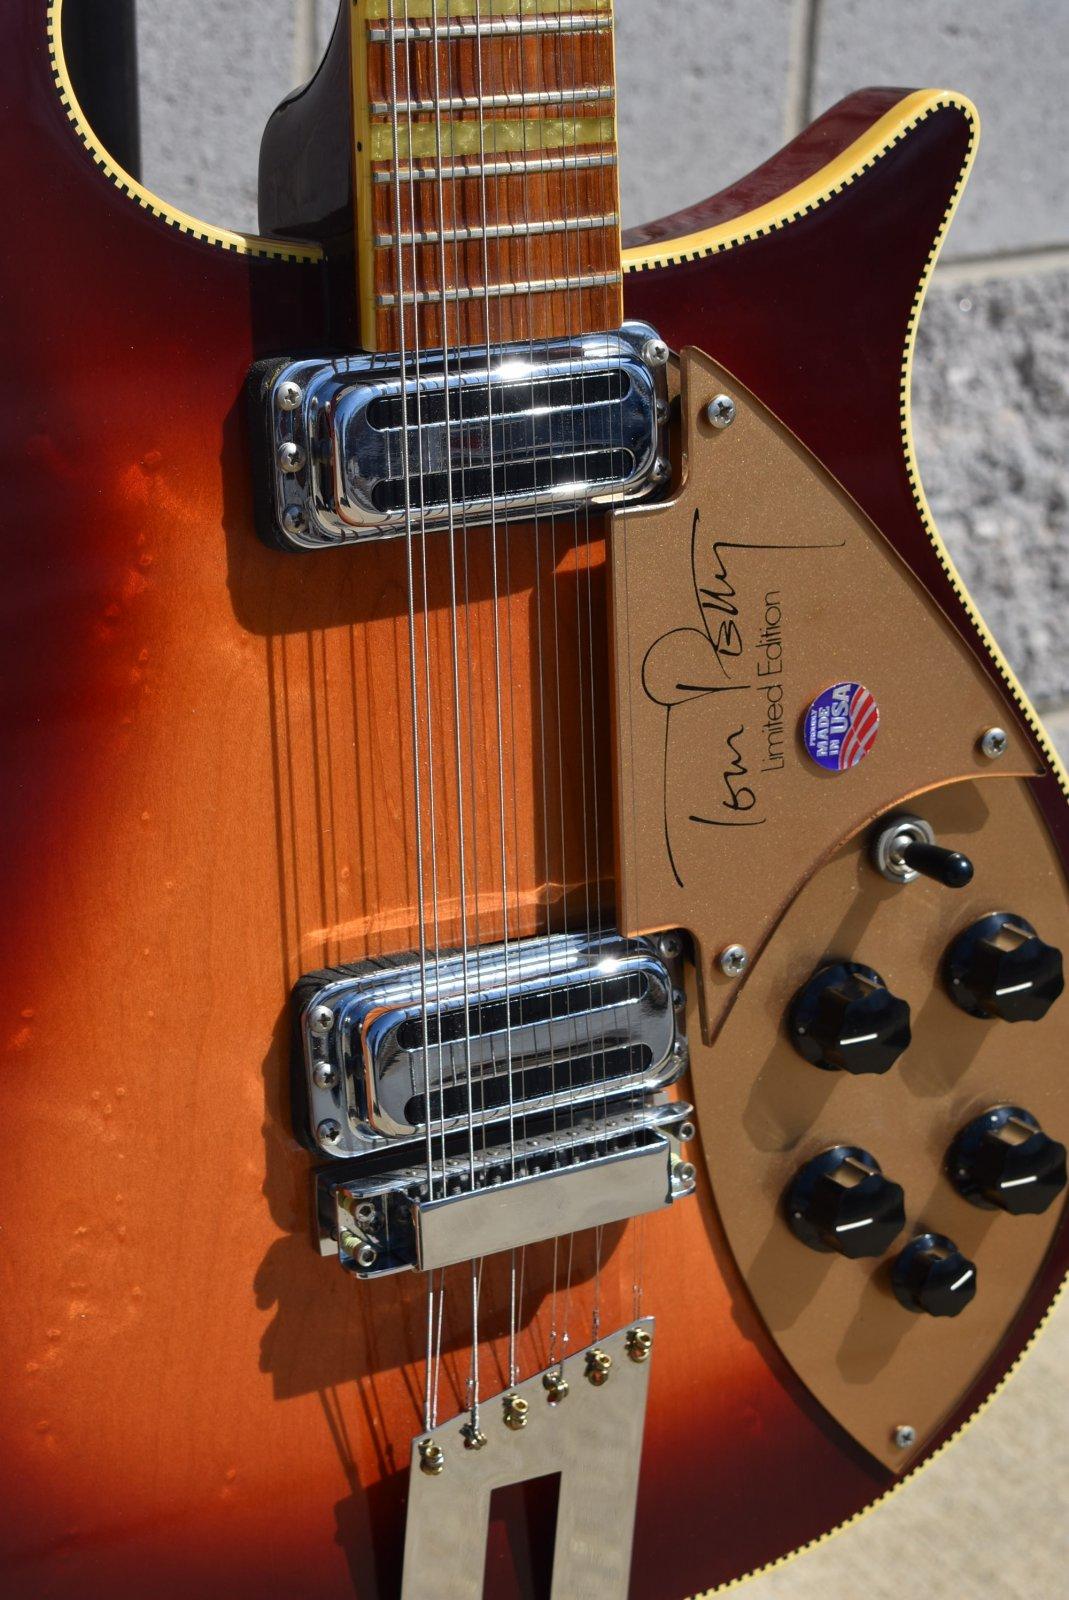 1991 Rickenbacker  660/12TP Tom Petty #366